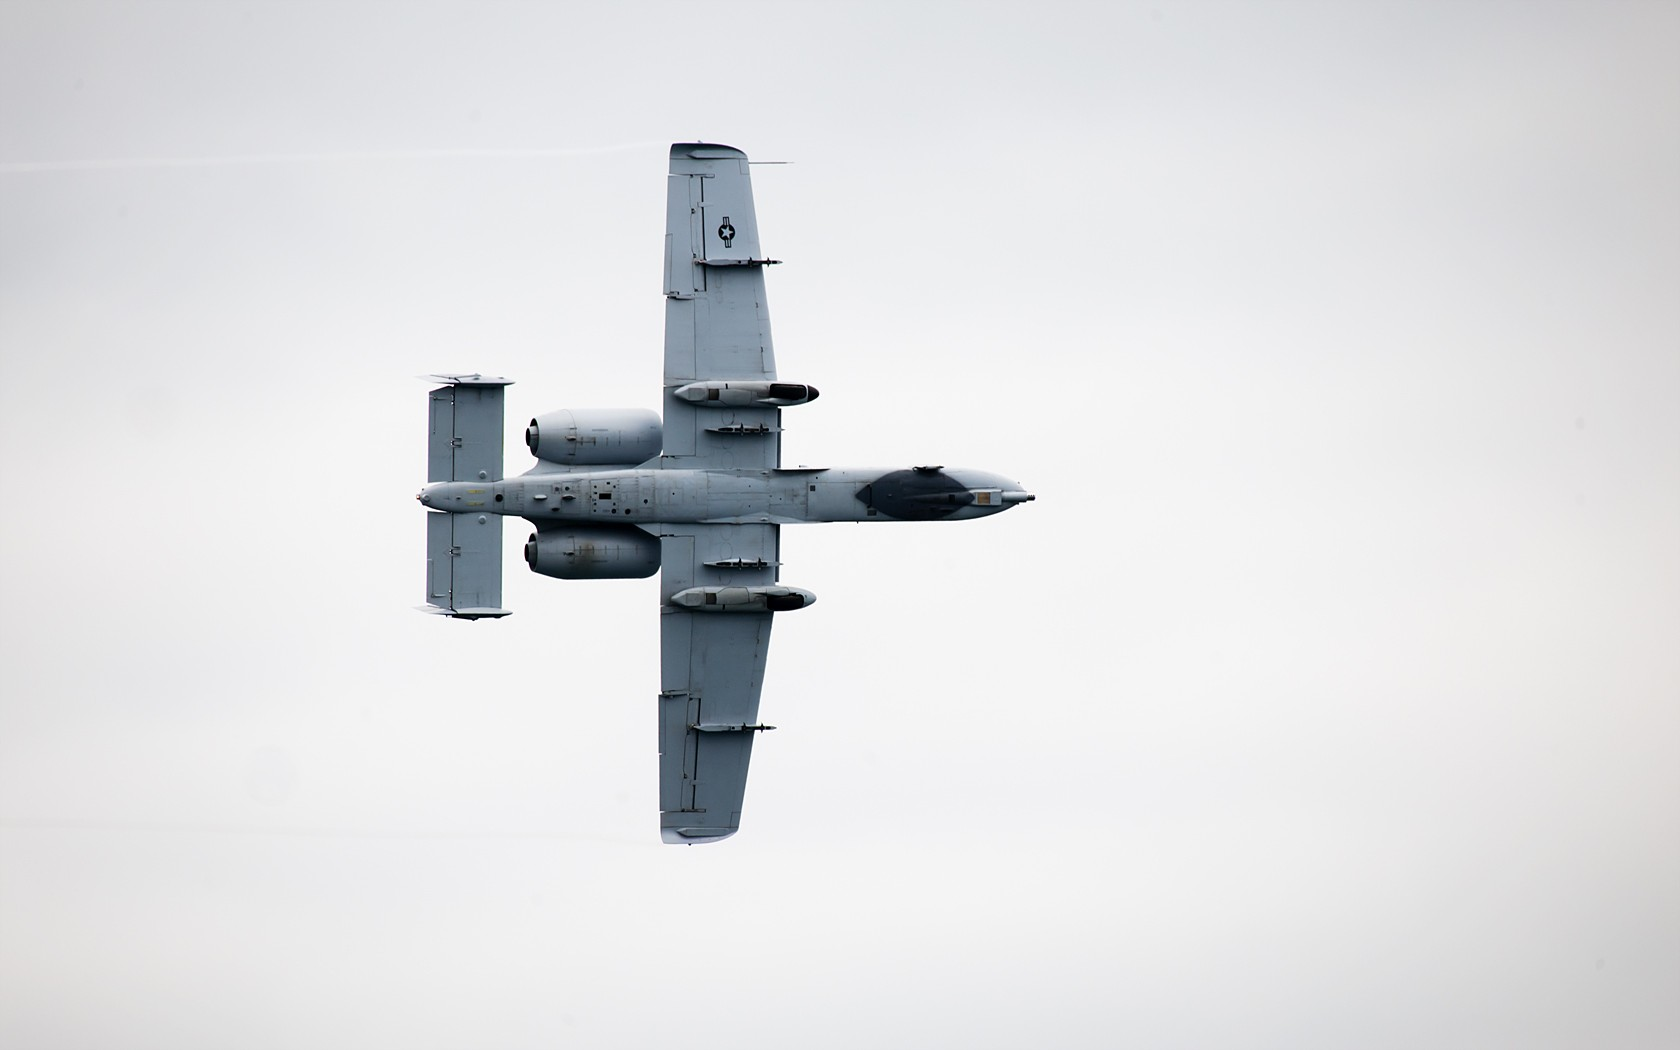 A-10 Thunderbolt II - 1680x1050